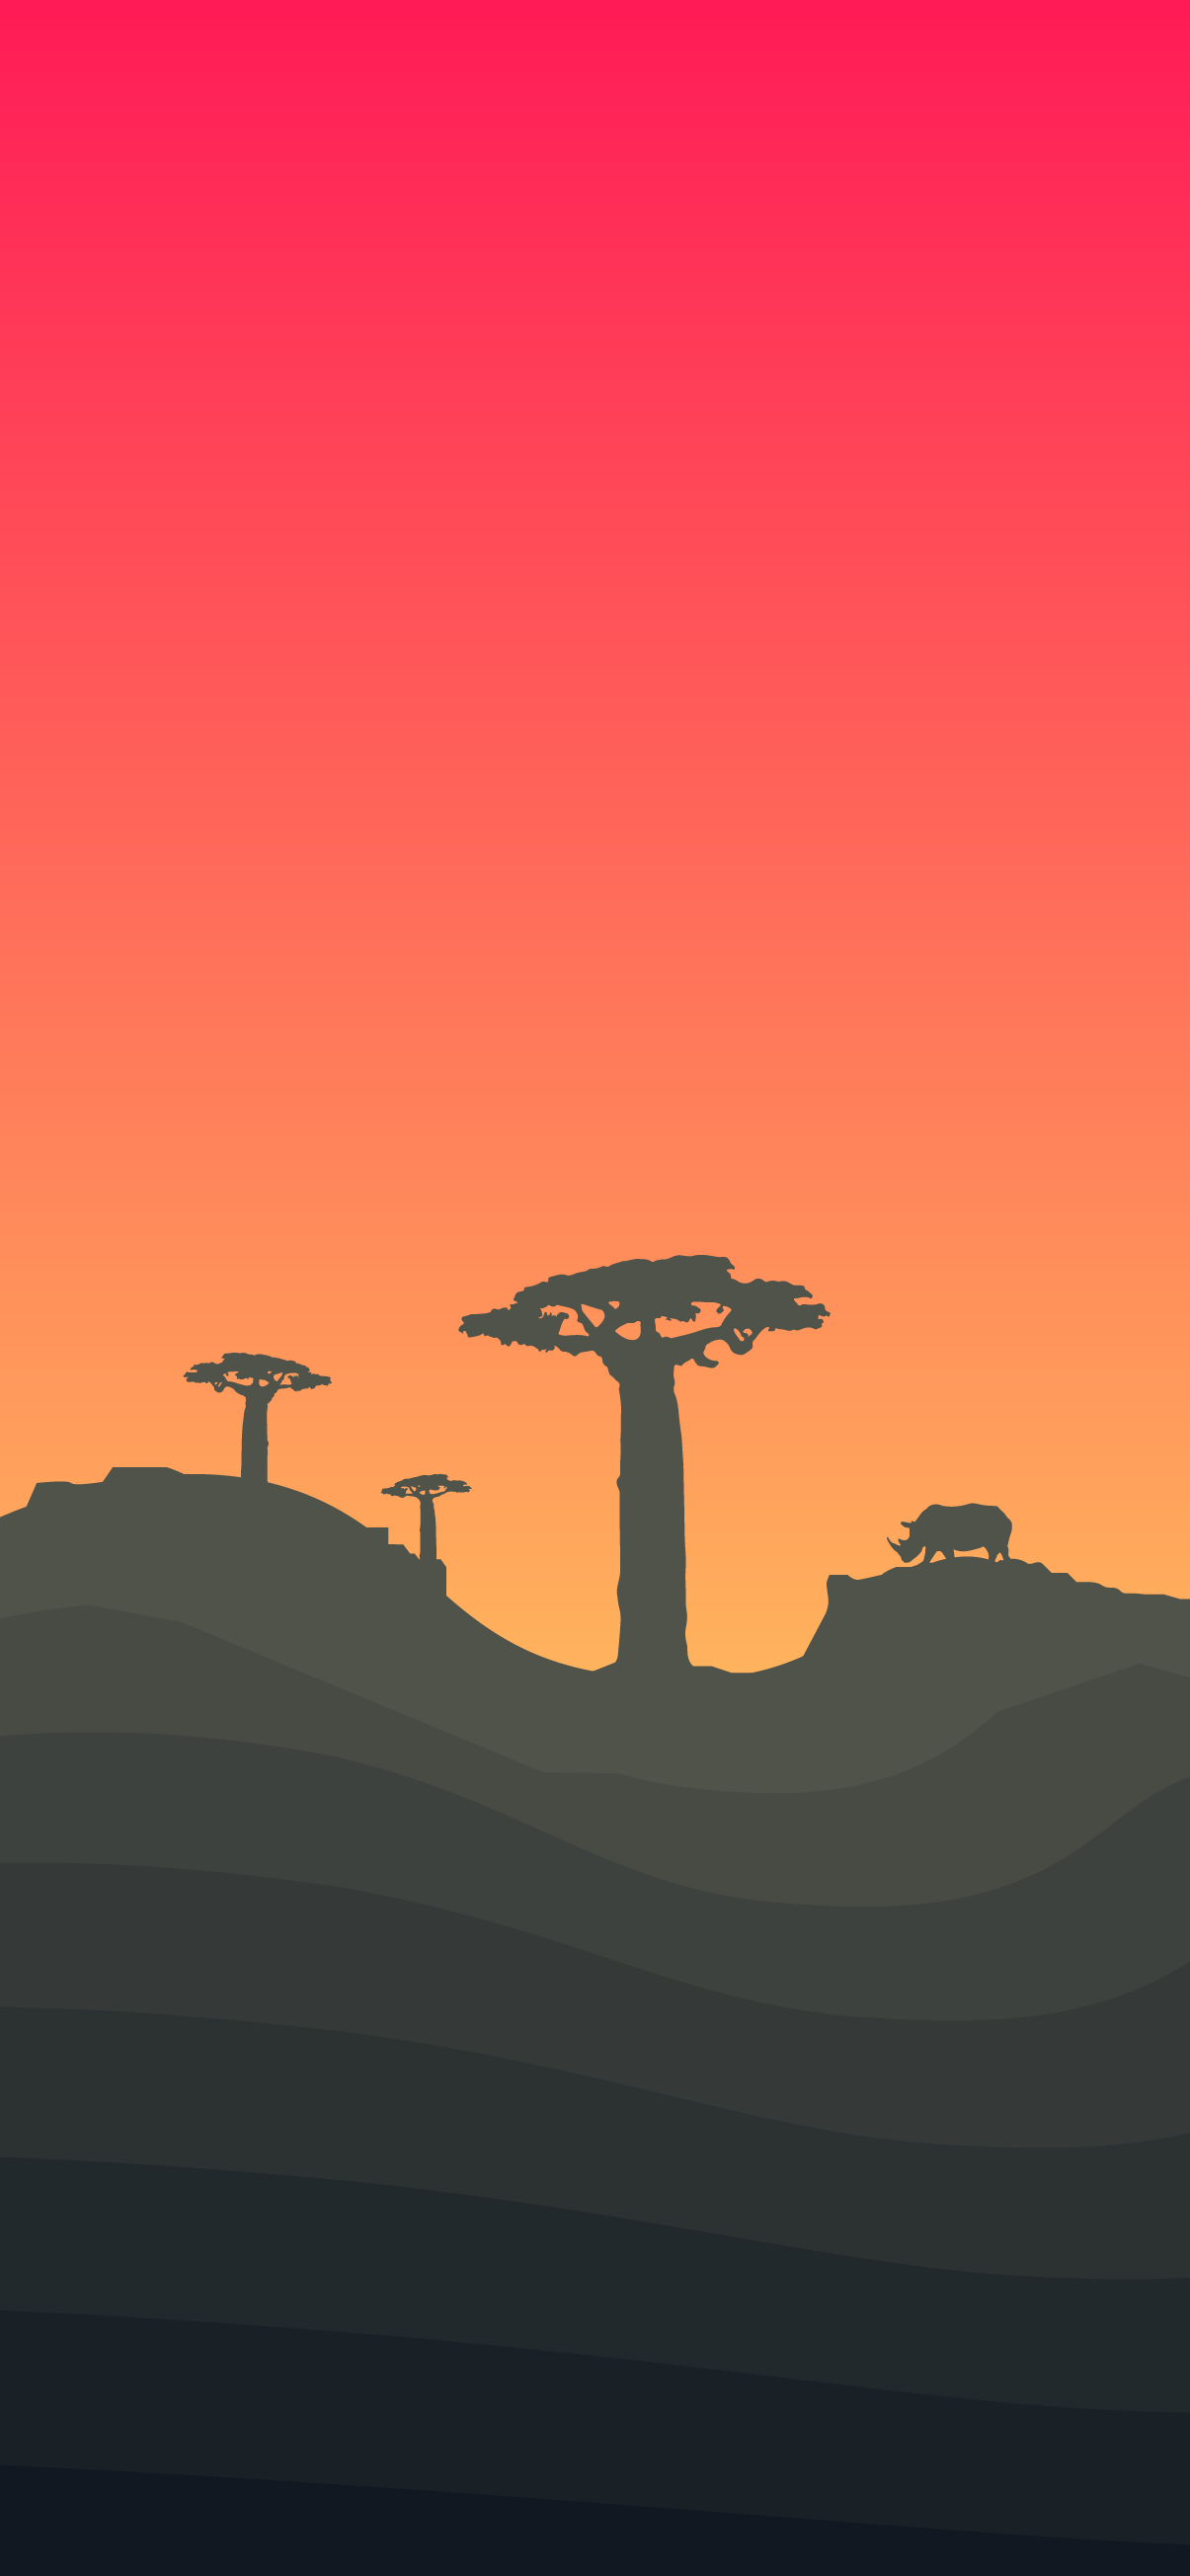 africa, rhino, baobab tree, minimalist, minimal, sunset